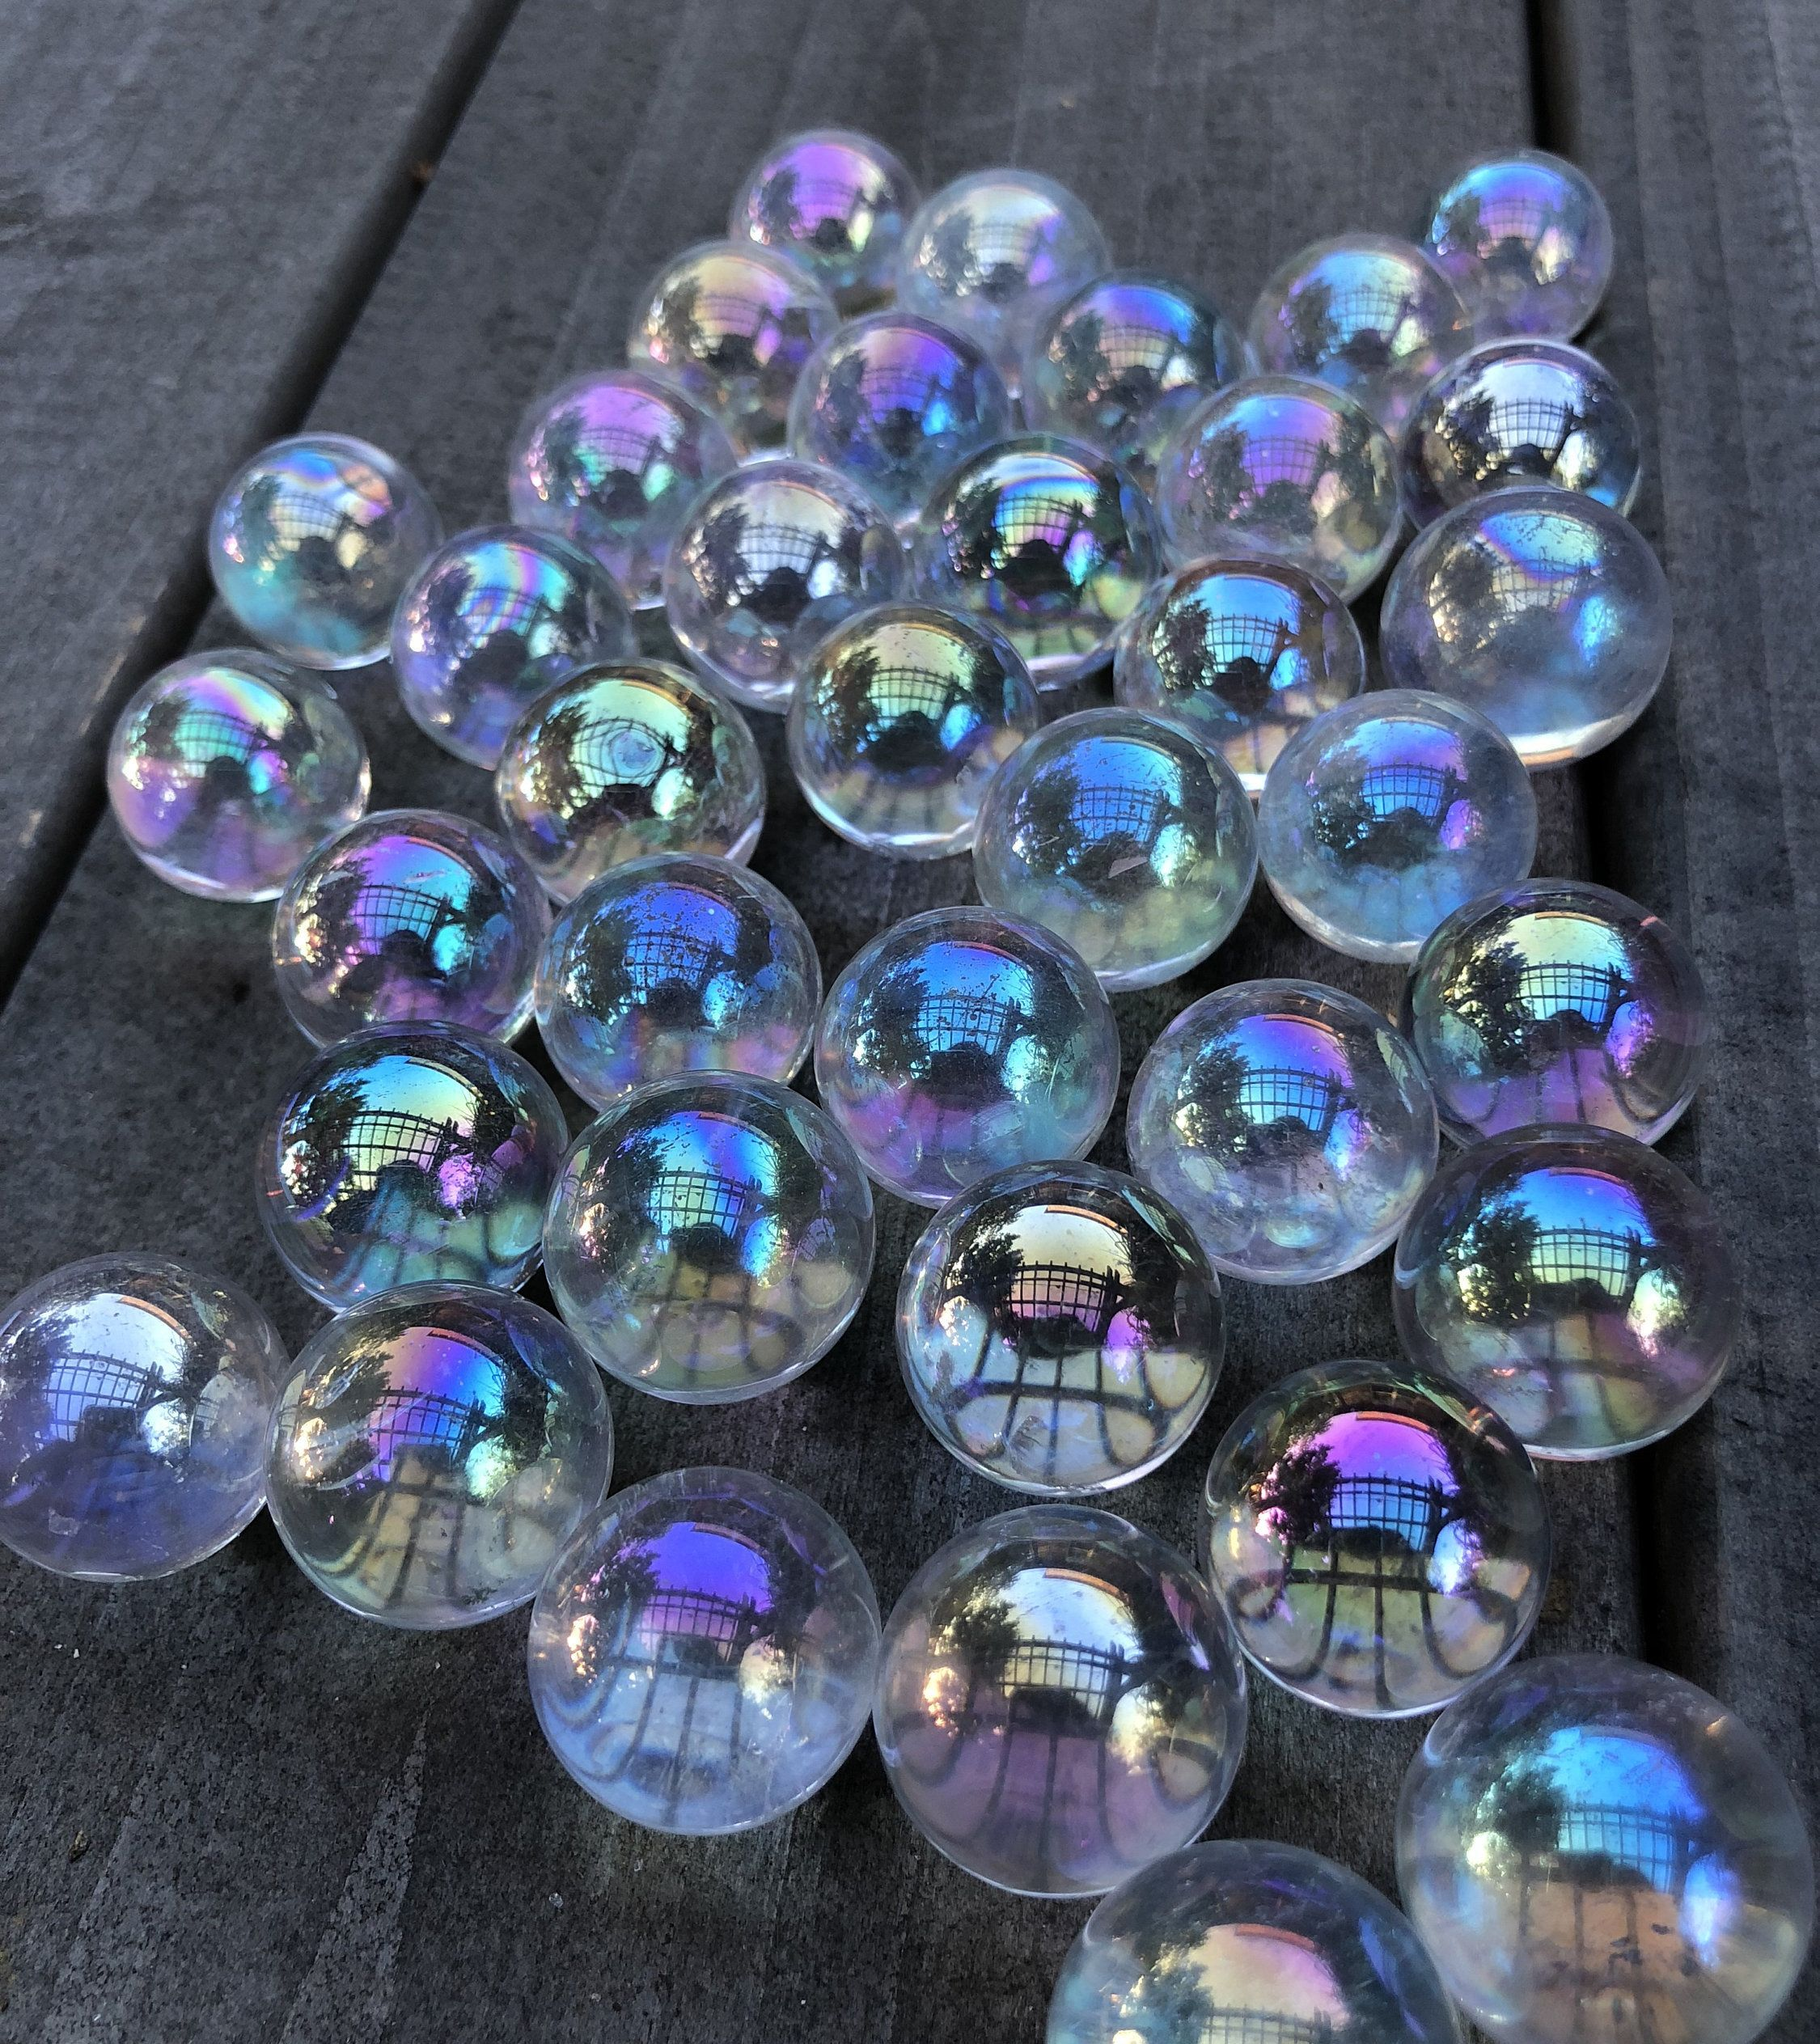 100pcs Mix Sizes Shapes Sew On Rhinestone Flatback 2Holes Acrylic Gems  Strass Crystal And Stones For Dress  f326af01664b